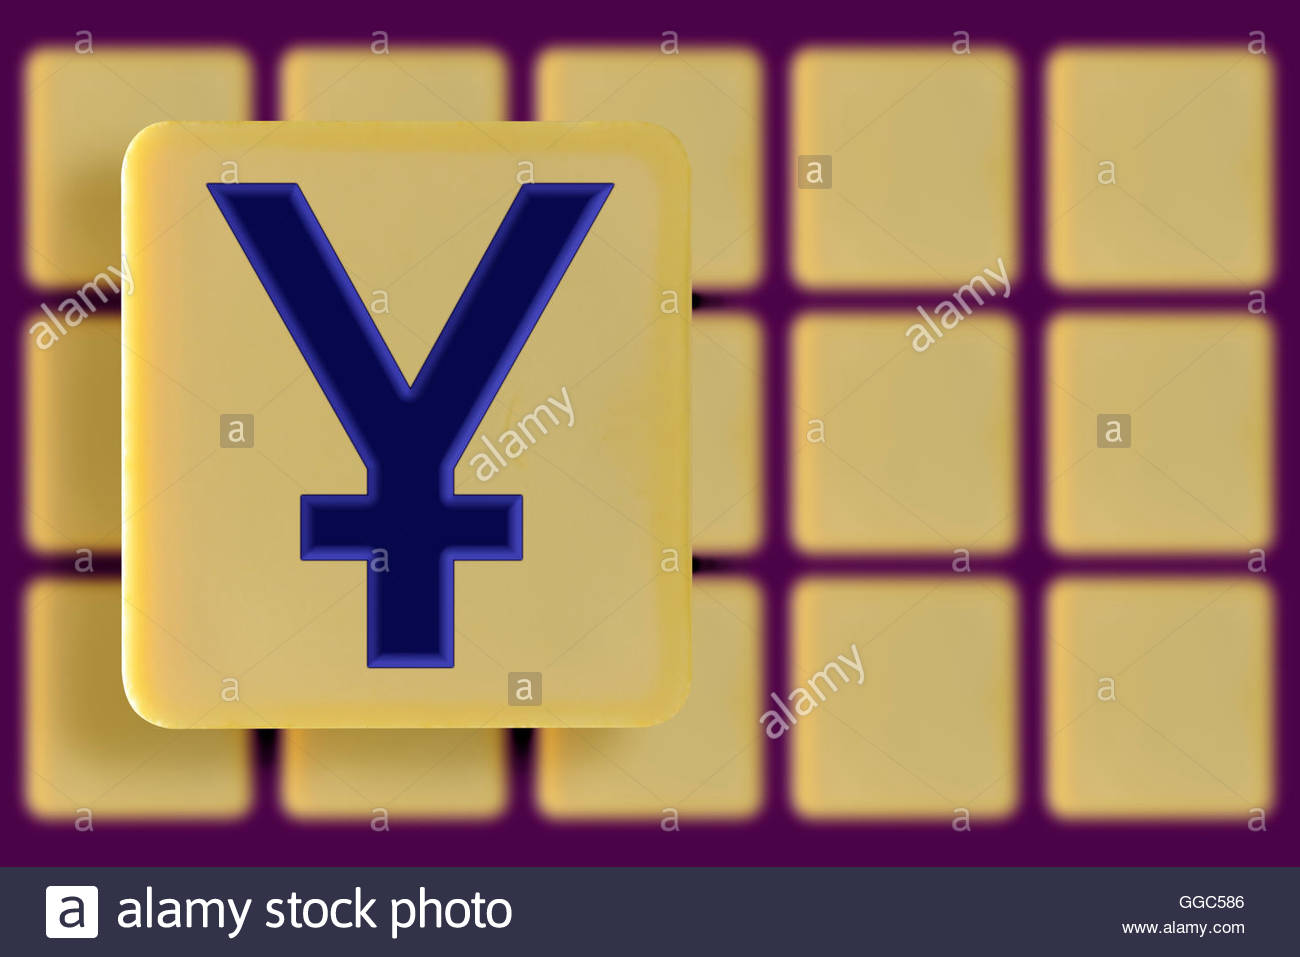 Currency Symbol Yen Yuan Alphabet Stock Photos Currency Symbol Yen